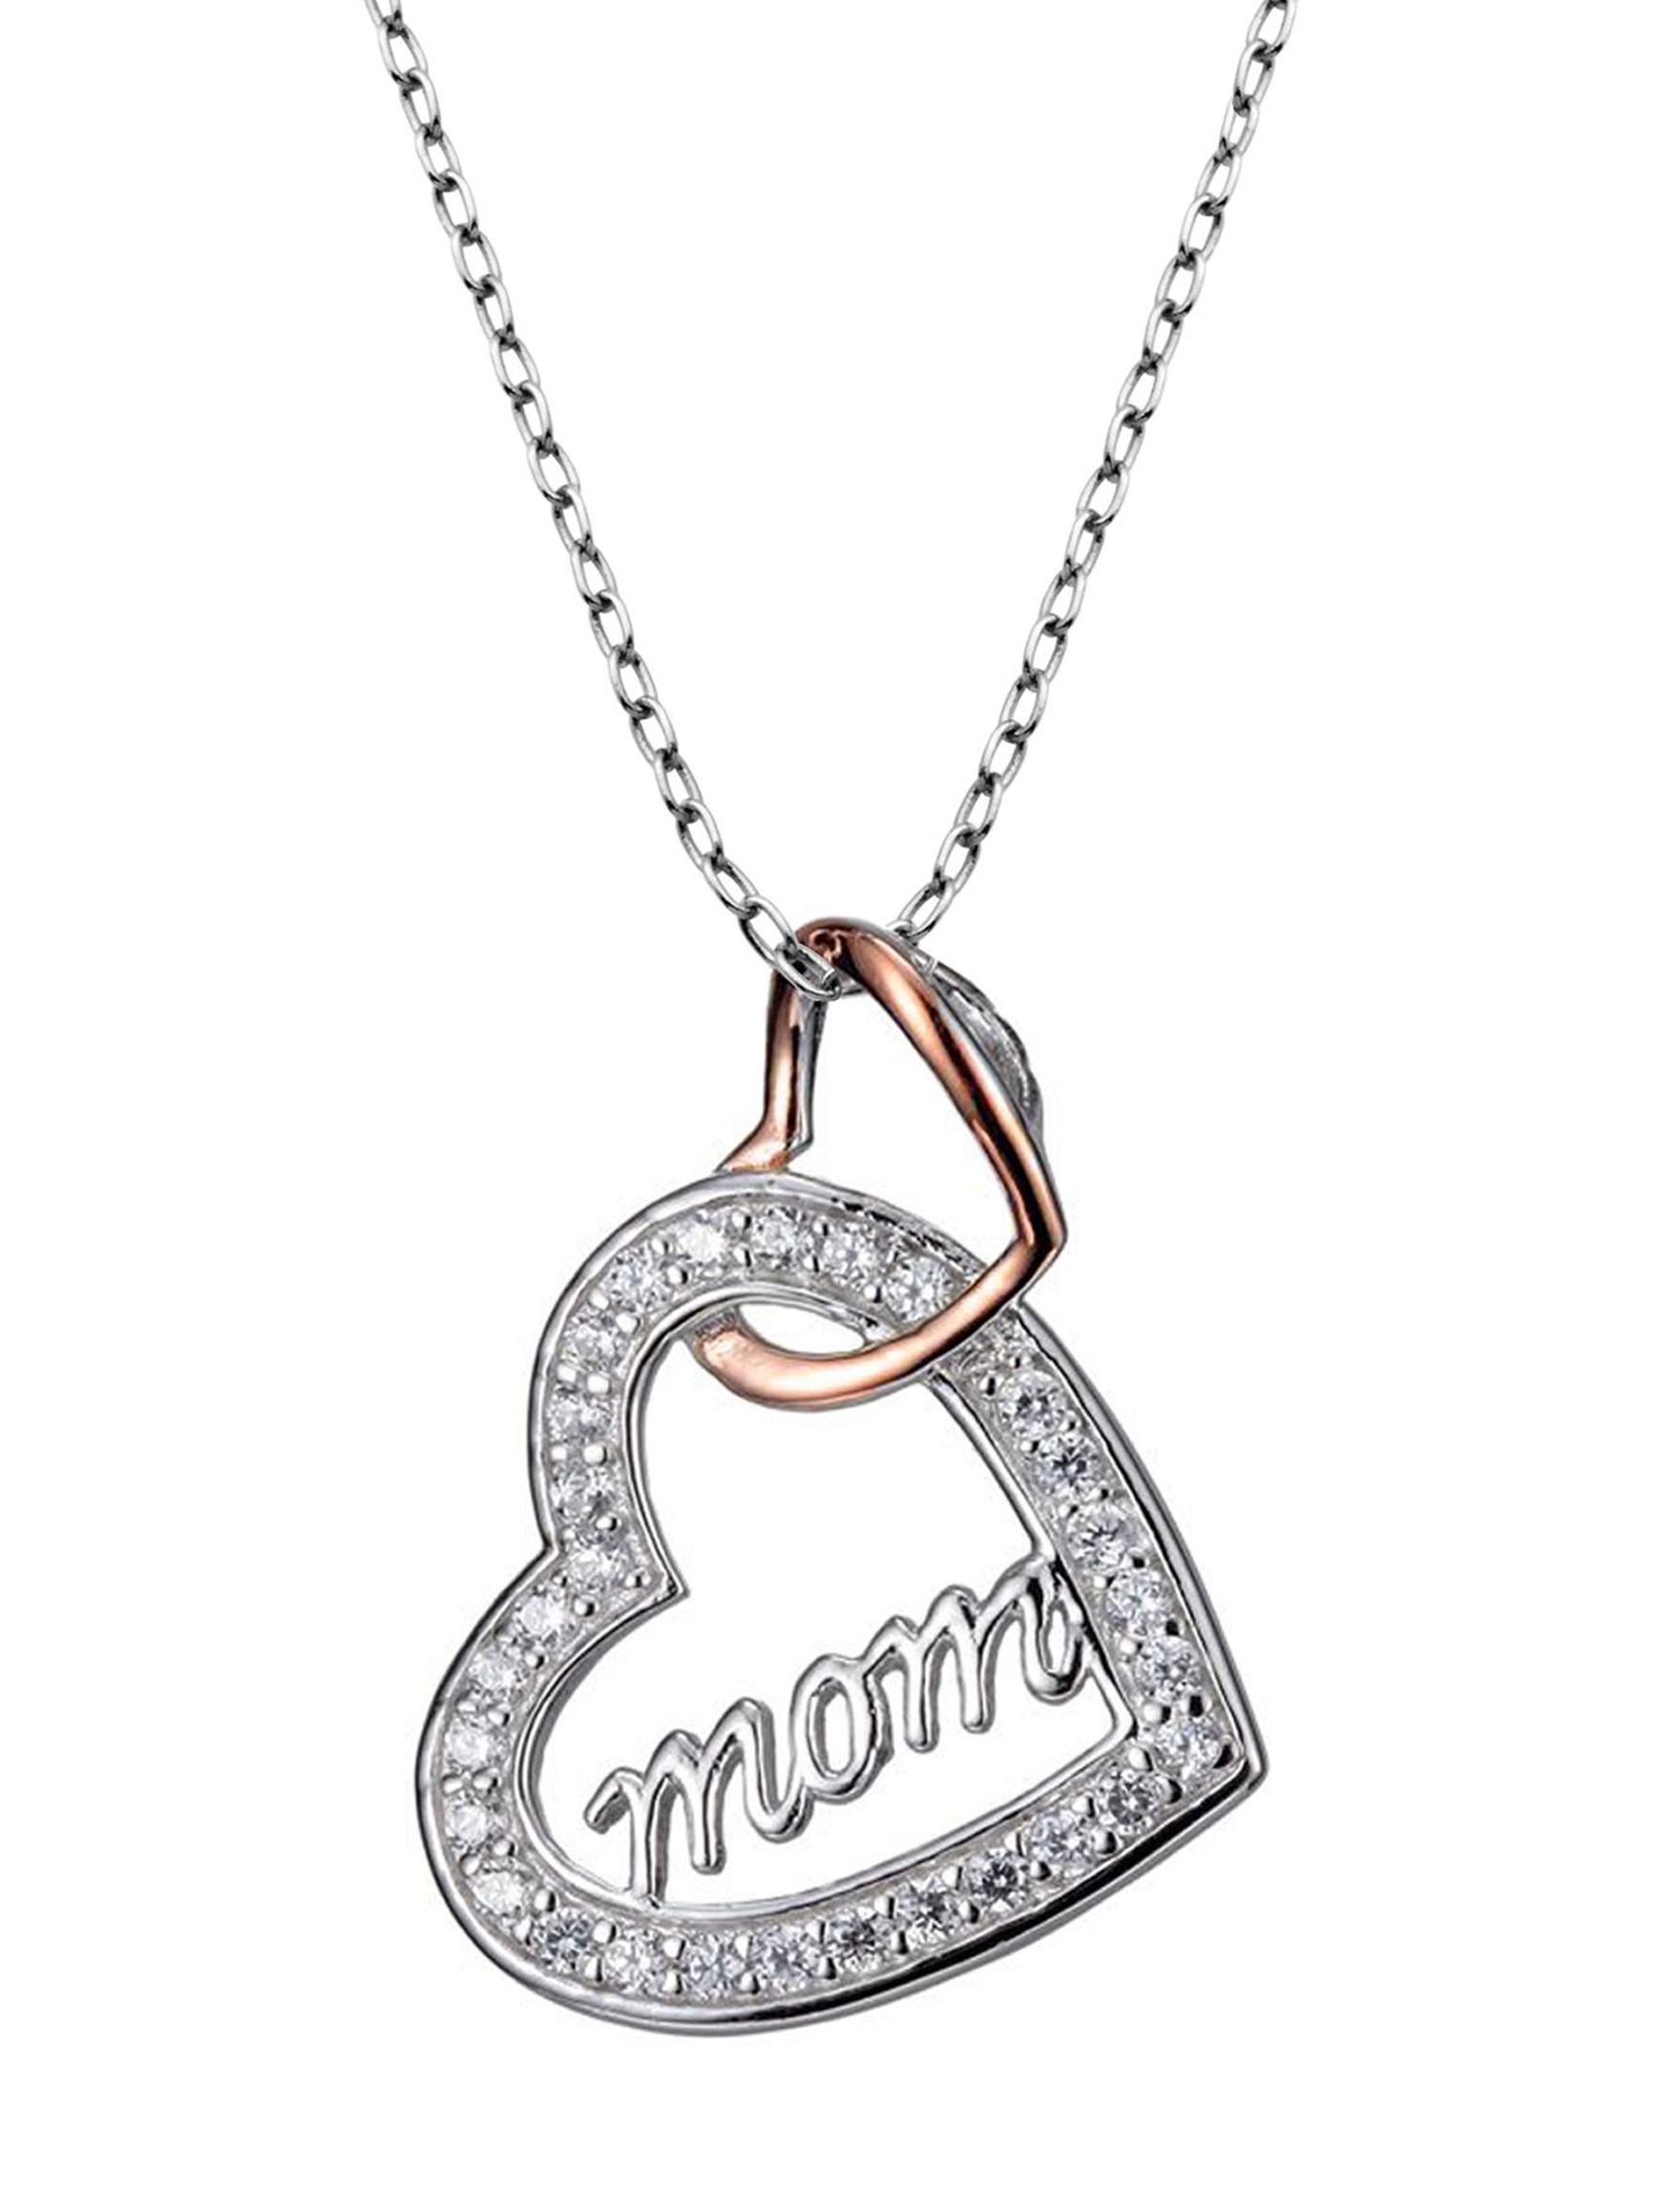 PAJ INC. Silver / Rose Gold Necklaces & Pendants Fine Jewelry